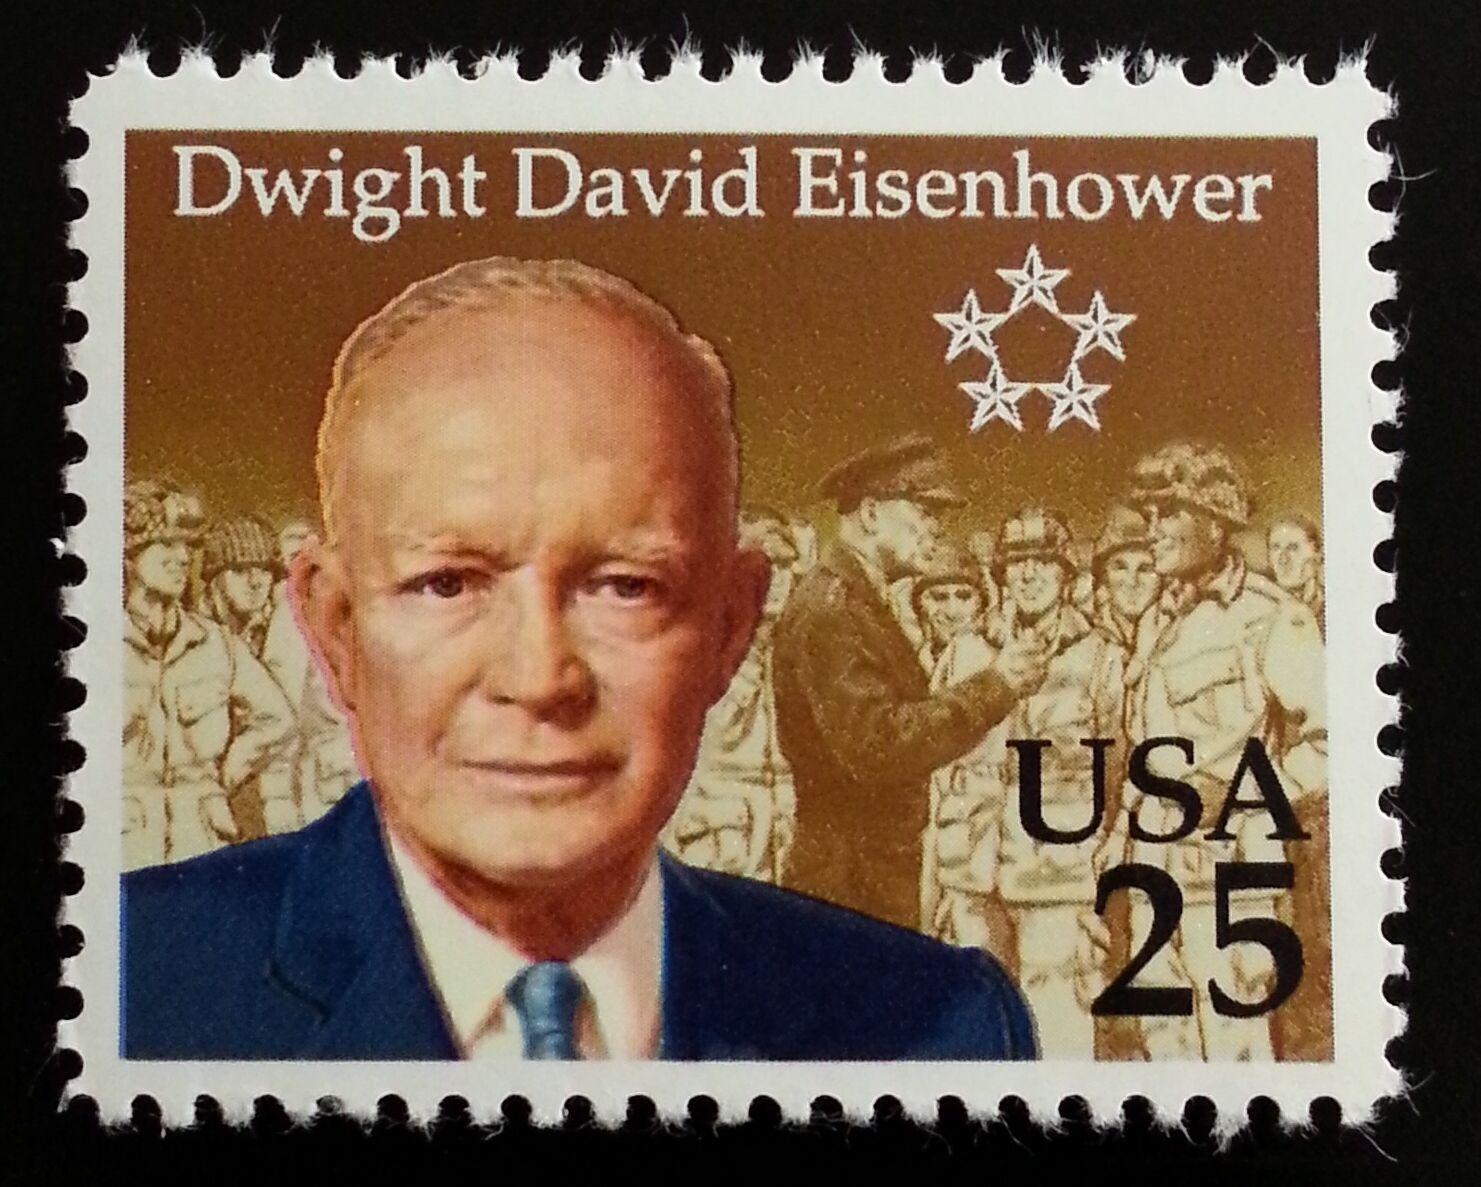 1990 25c Dwight David Eisenhower, Birth Scott 2513 Mint